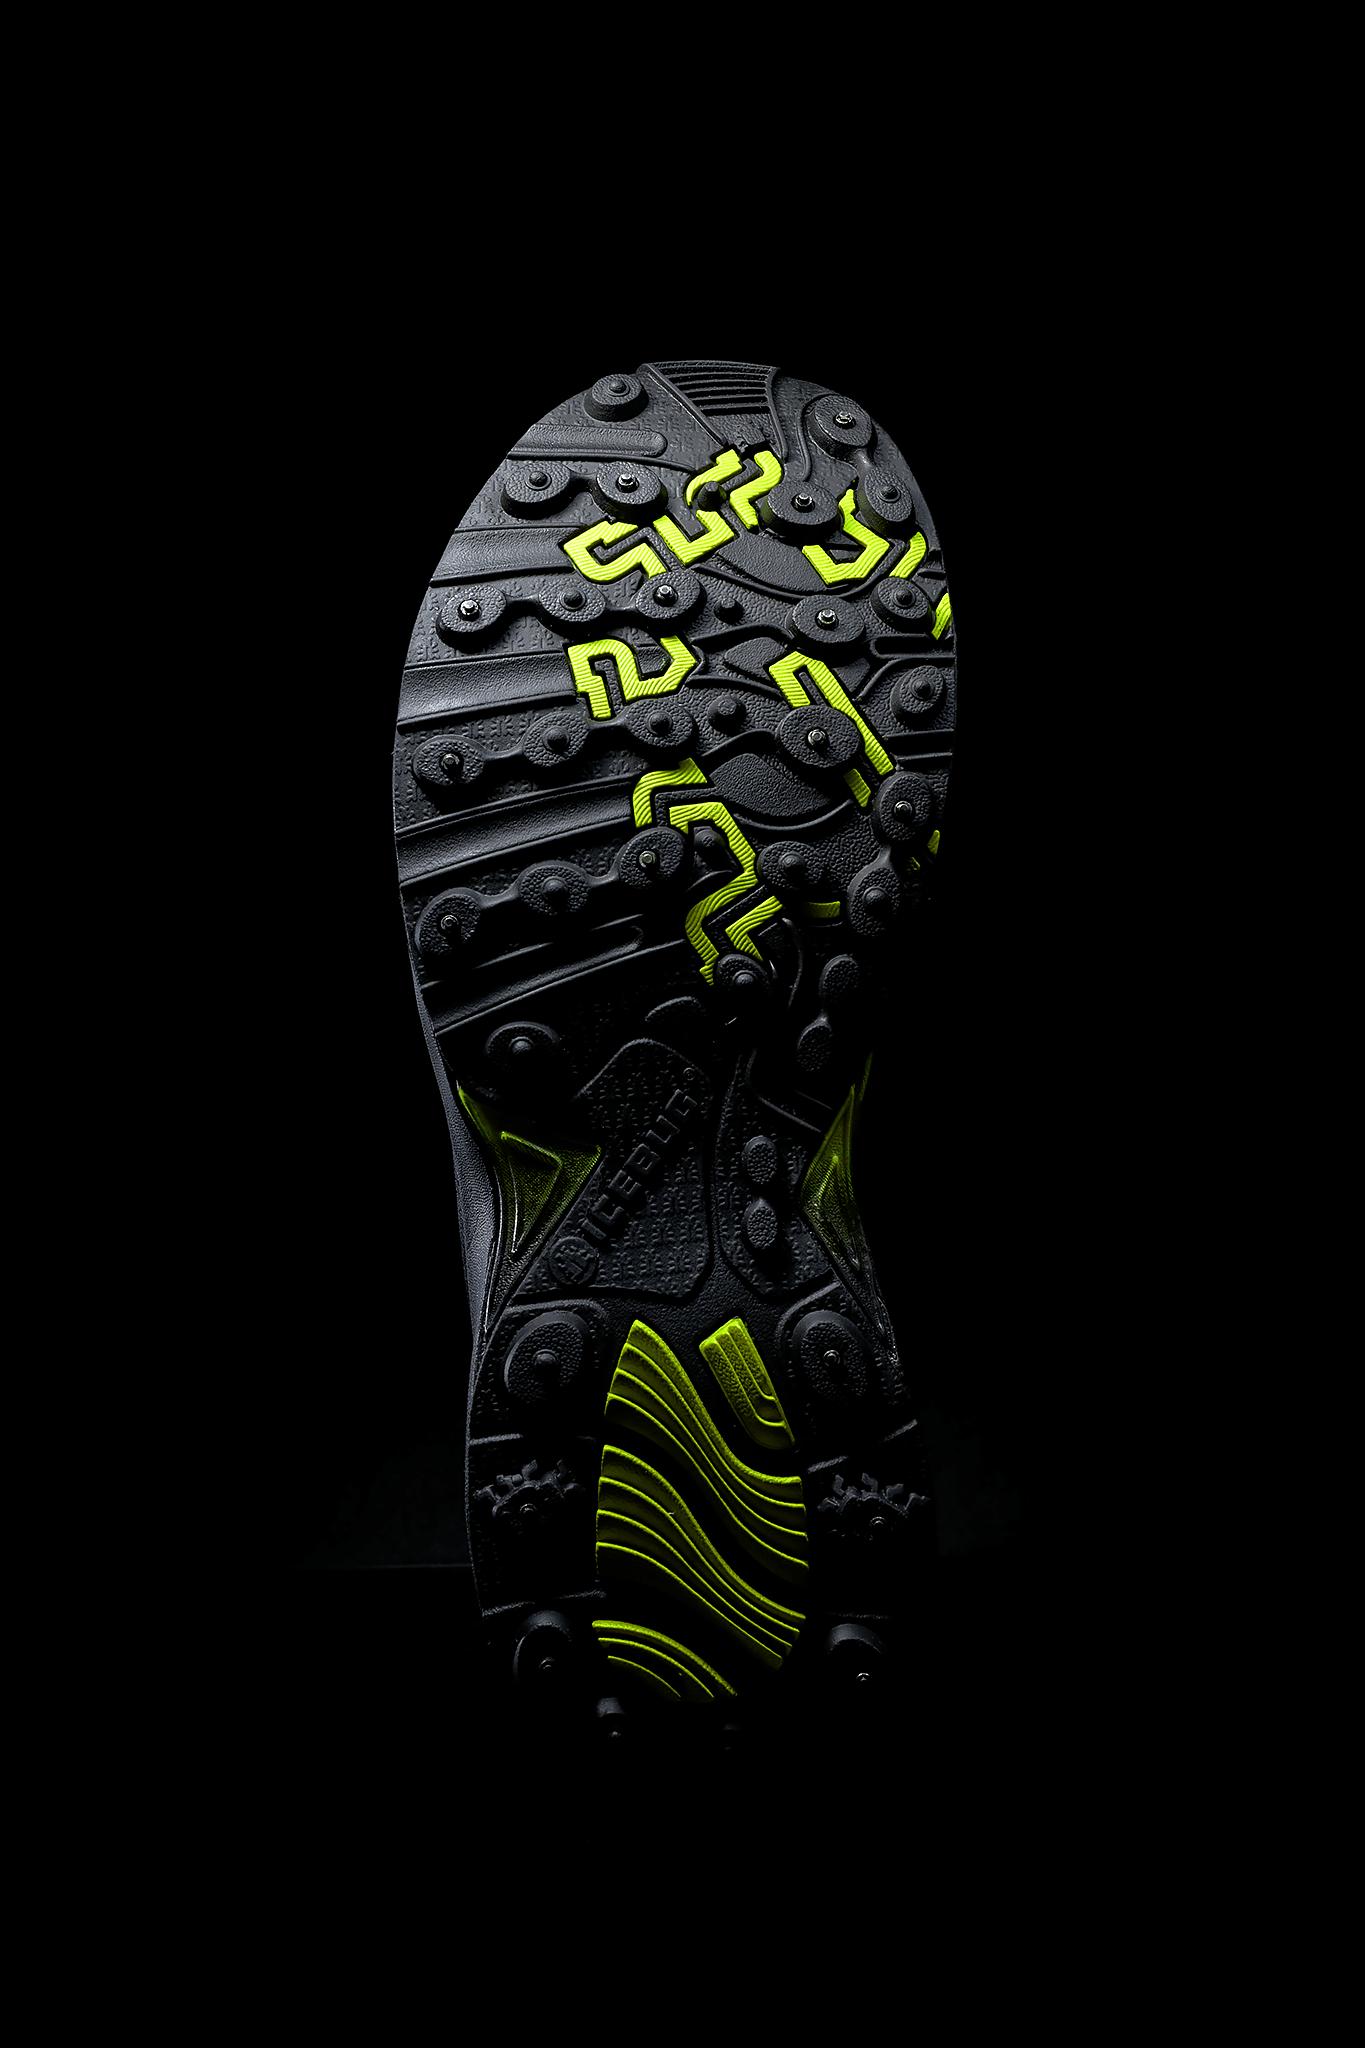 Icebug shoe sole and studs